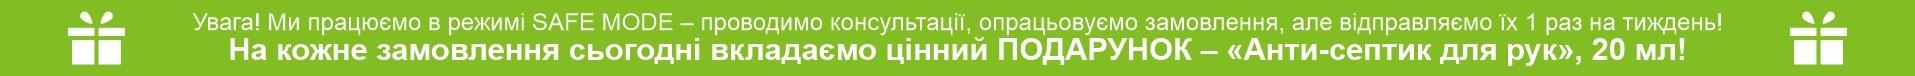 Banner MG Coronav